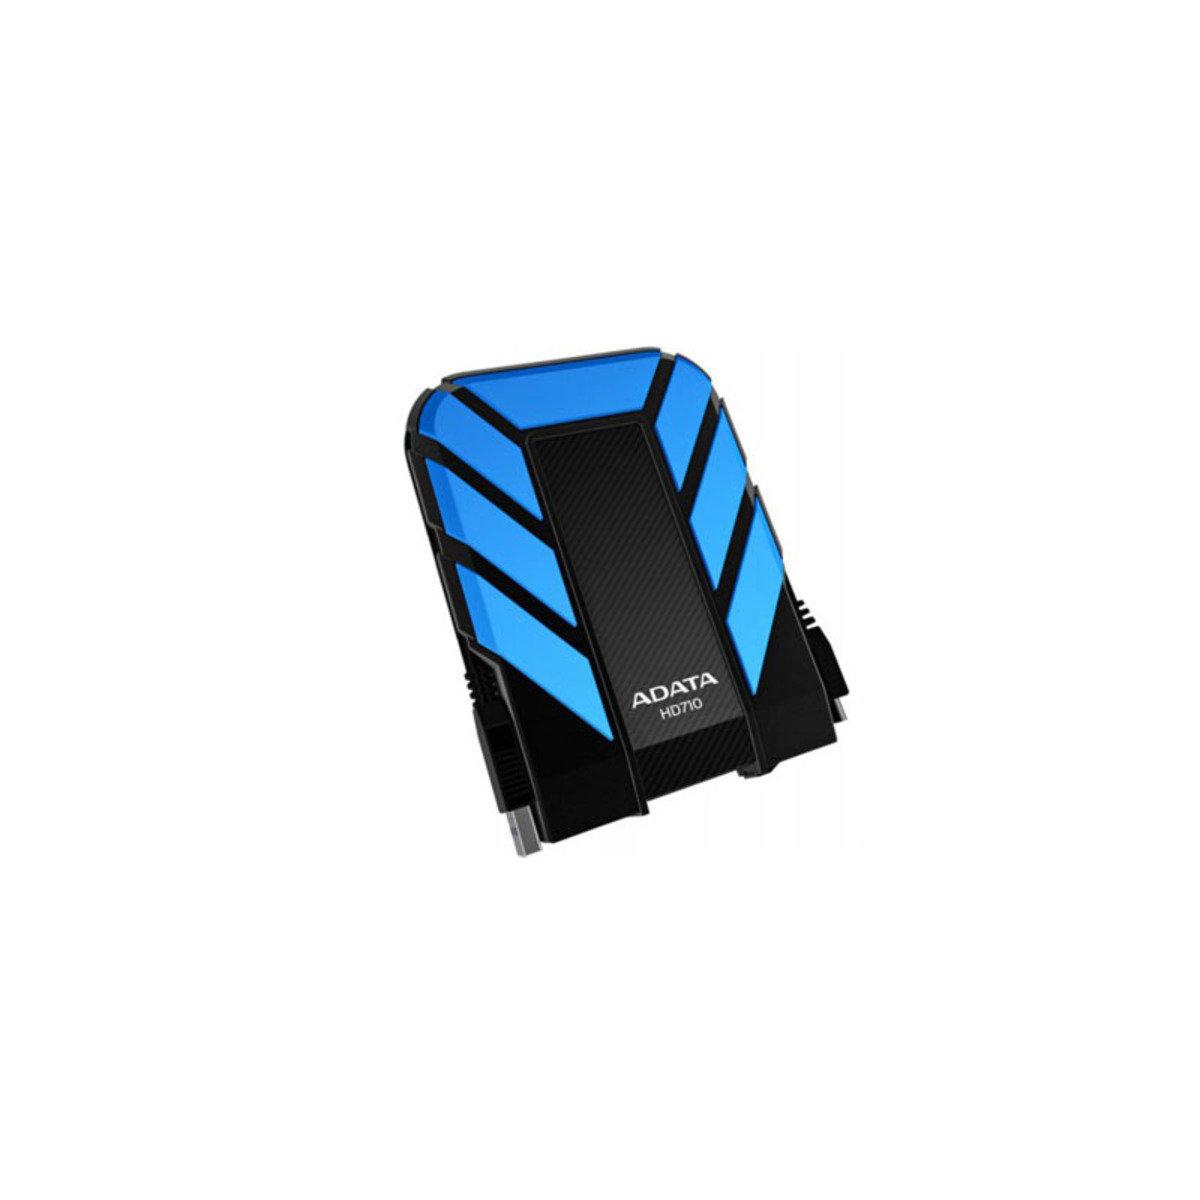 IP68 防水、防塵、抗震 USB 3.0 外置硬碟 HD710 1TB 藍色